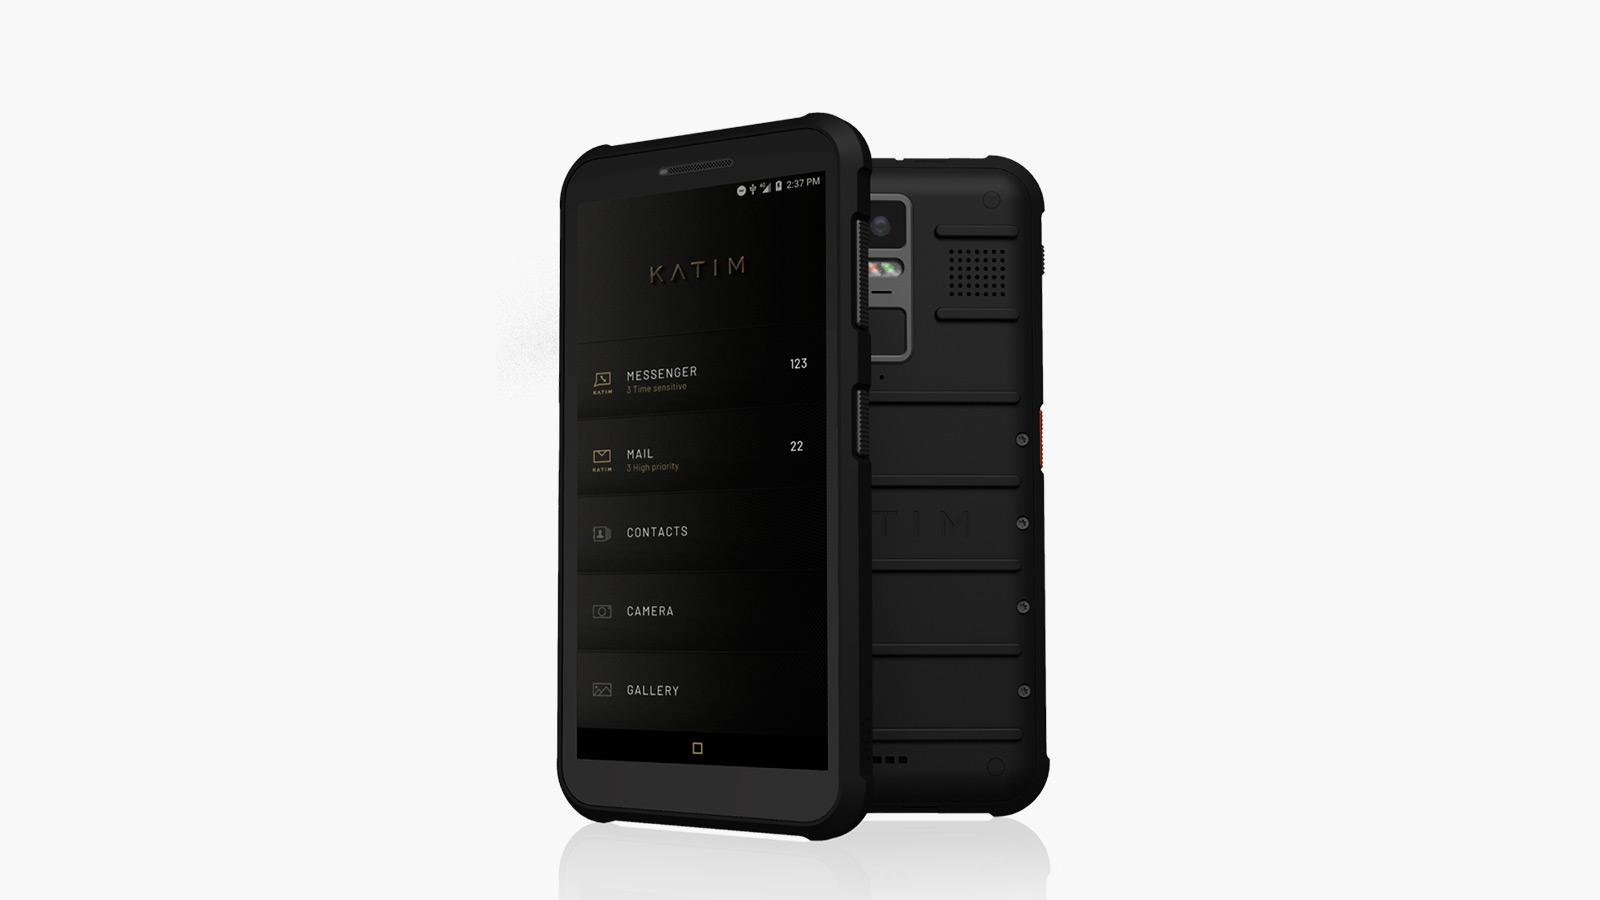 DarkMatter KATIM R01 Ultra Secure Smartphone